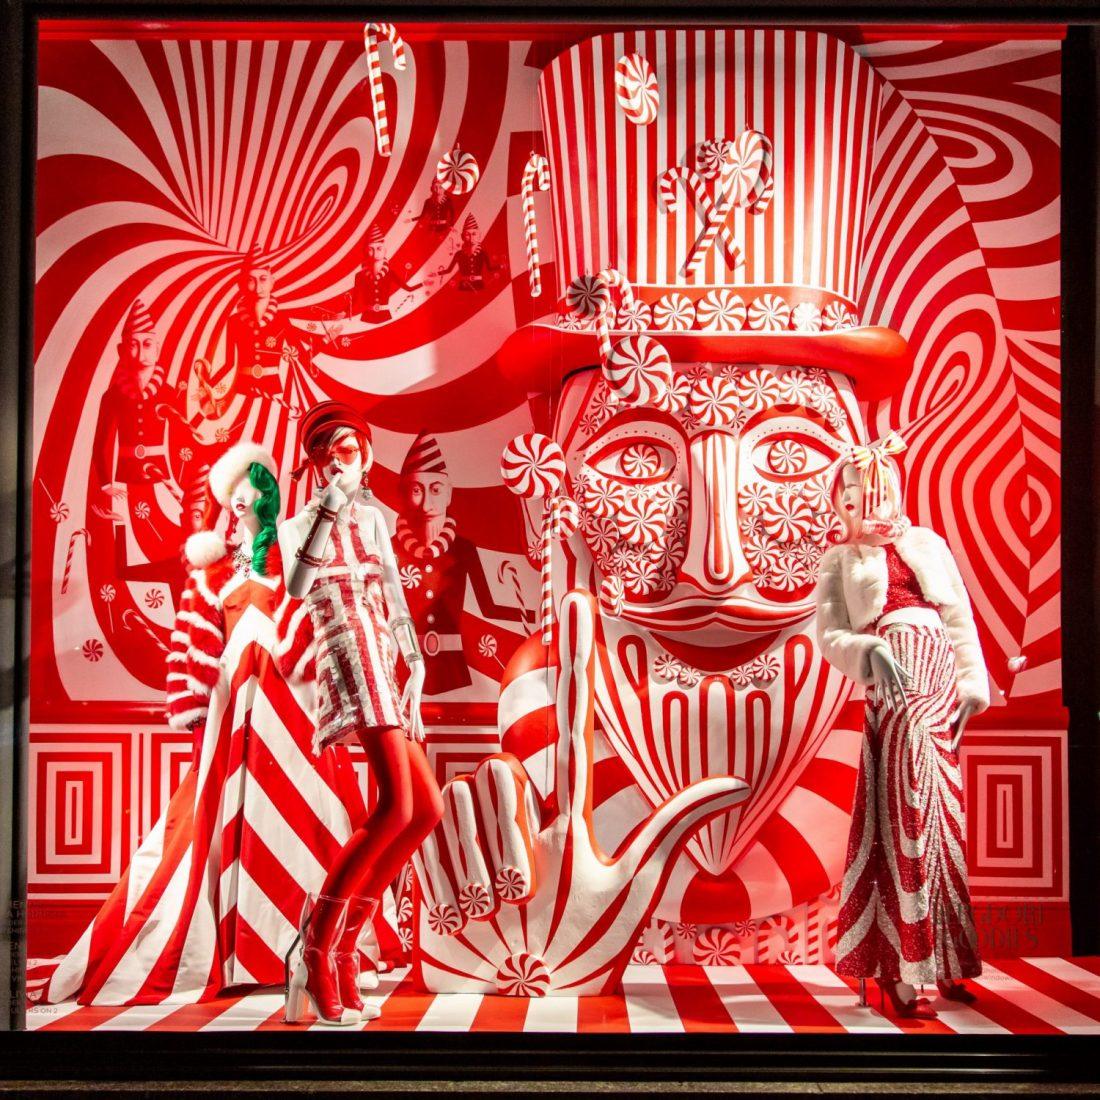 Bergdorf Goodman : Holiday 2018 Window Reveal